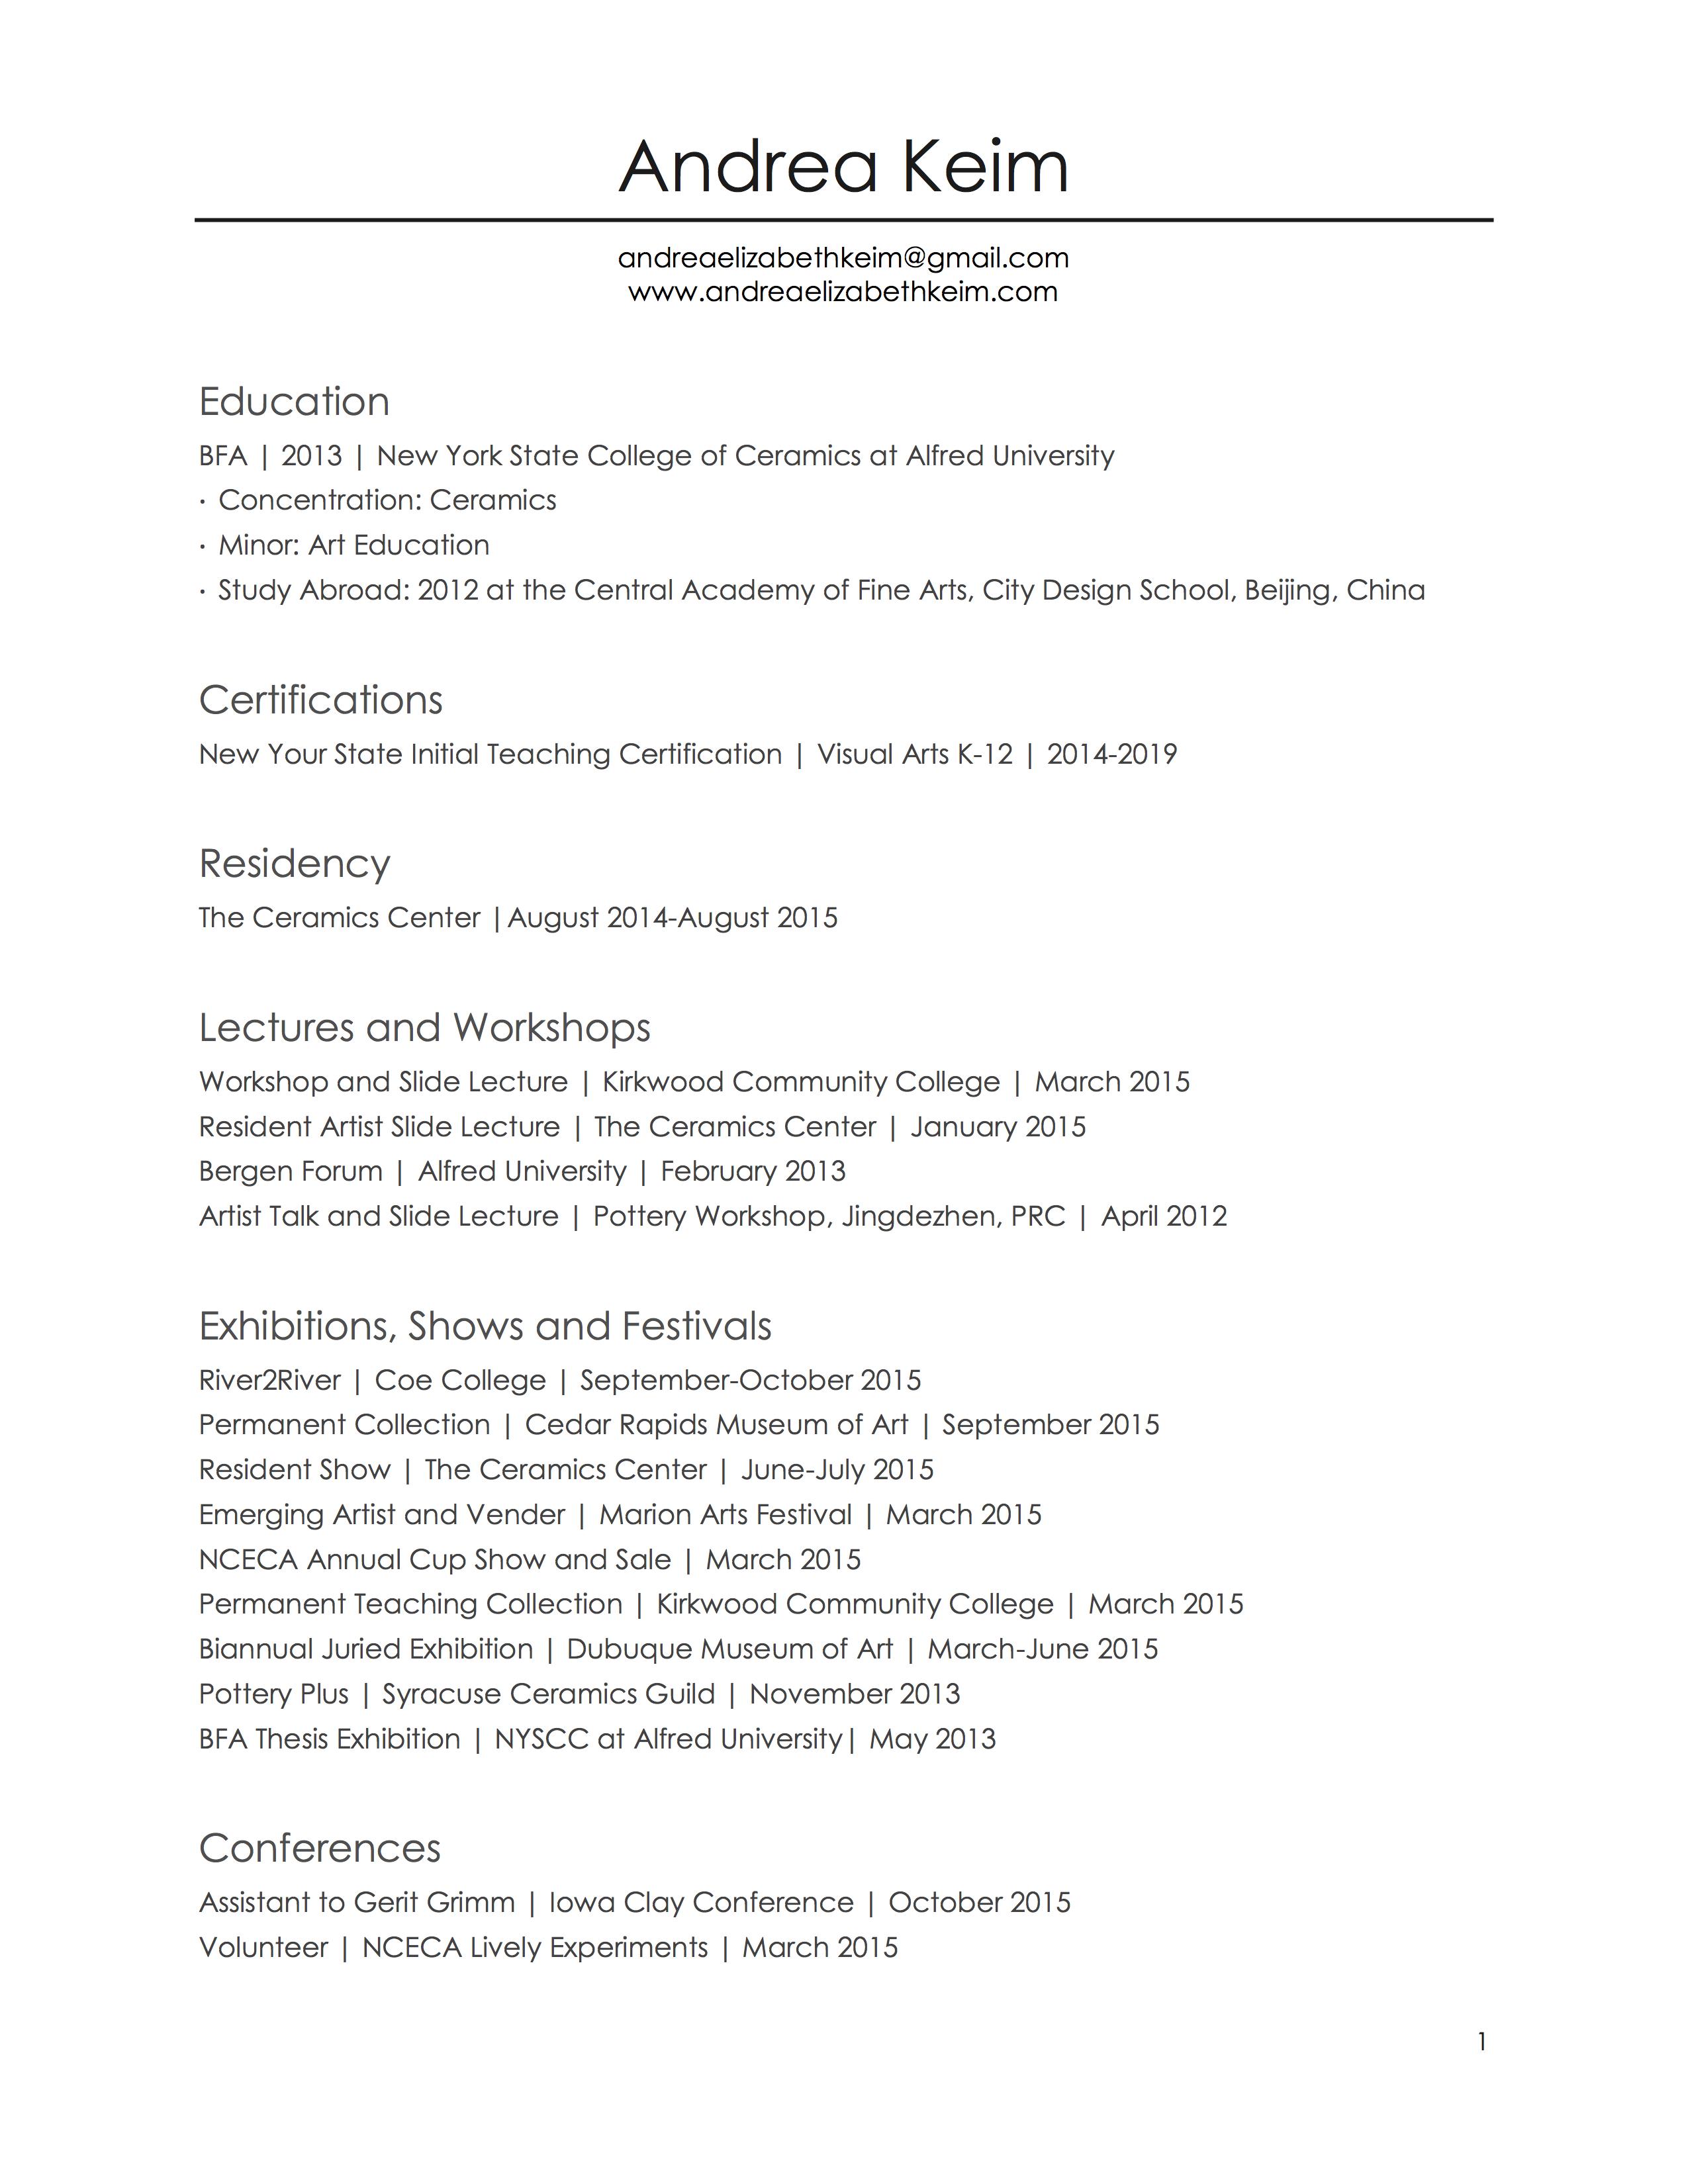 Simple CV February 2016 1